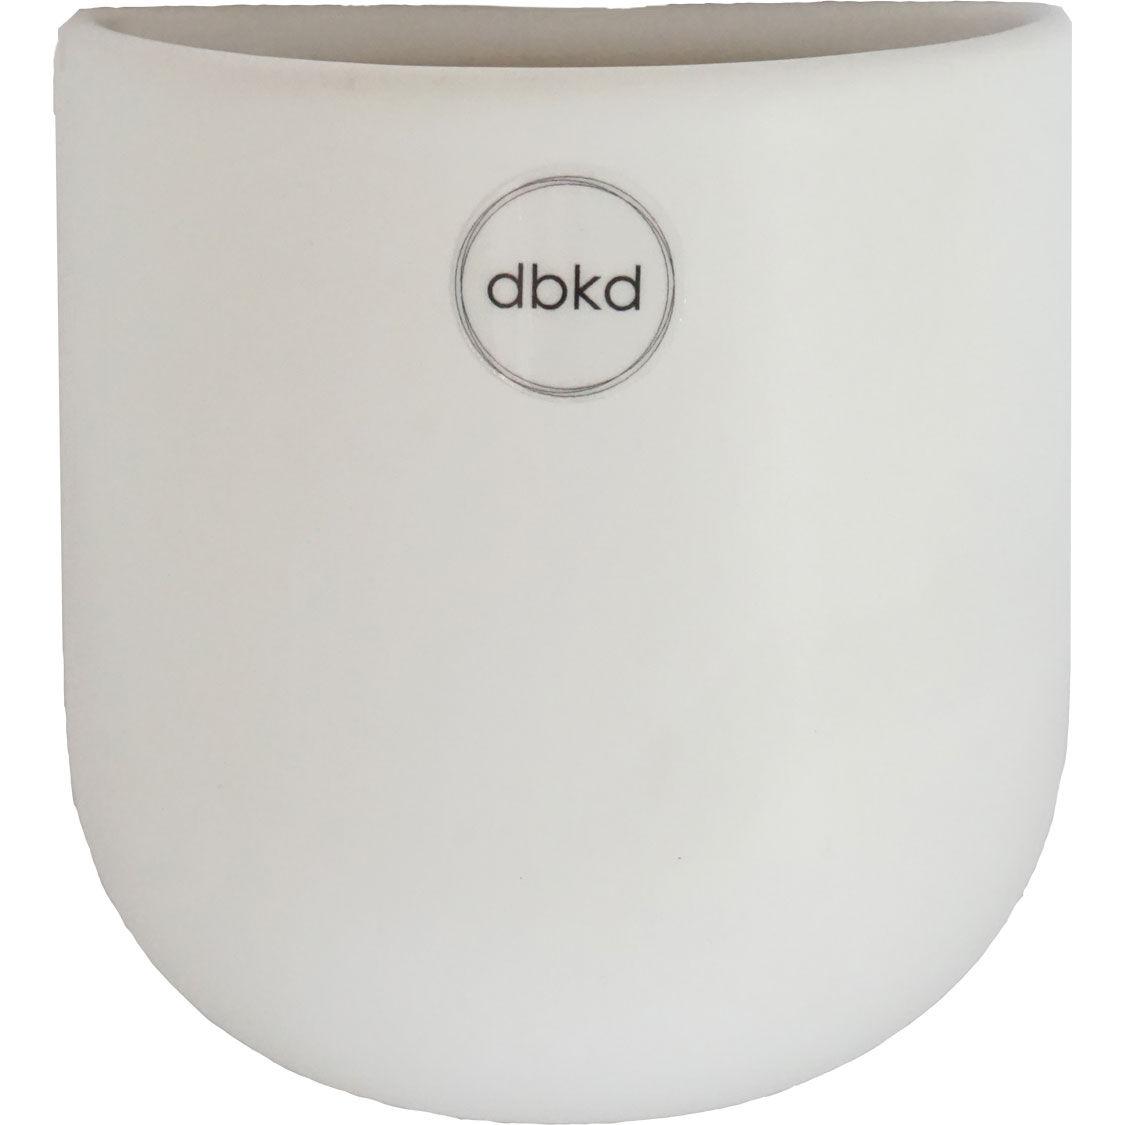 DBKD Cut Wall Pot Small, White